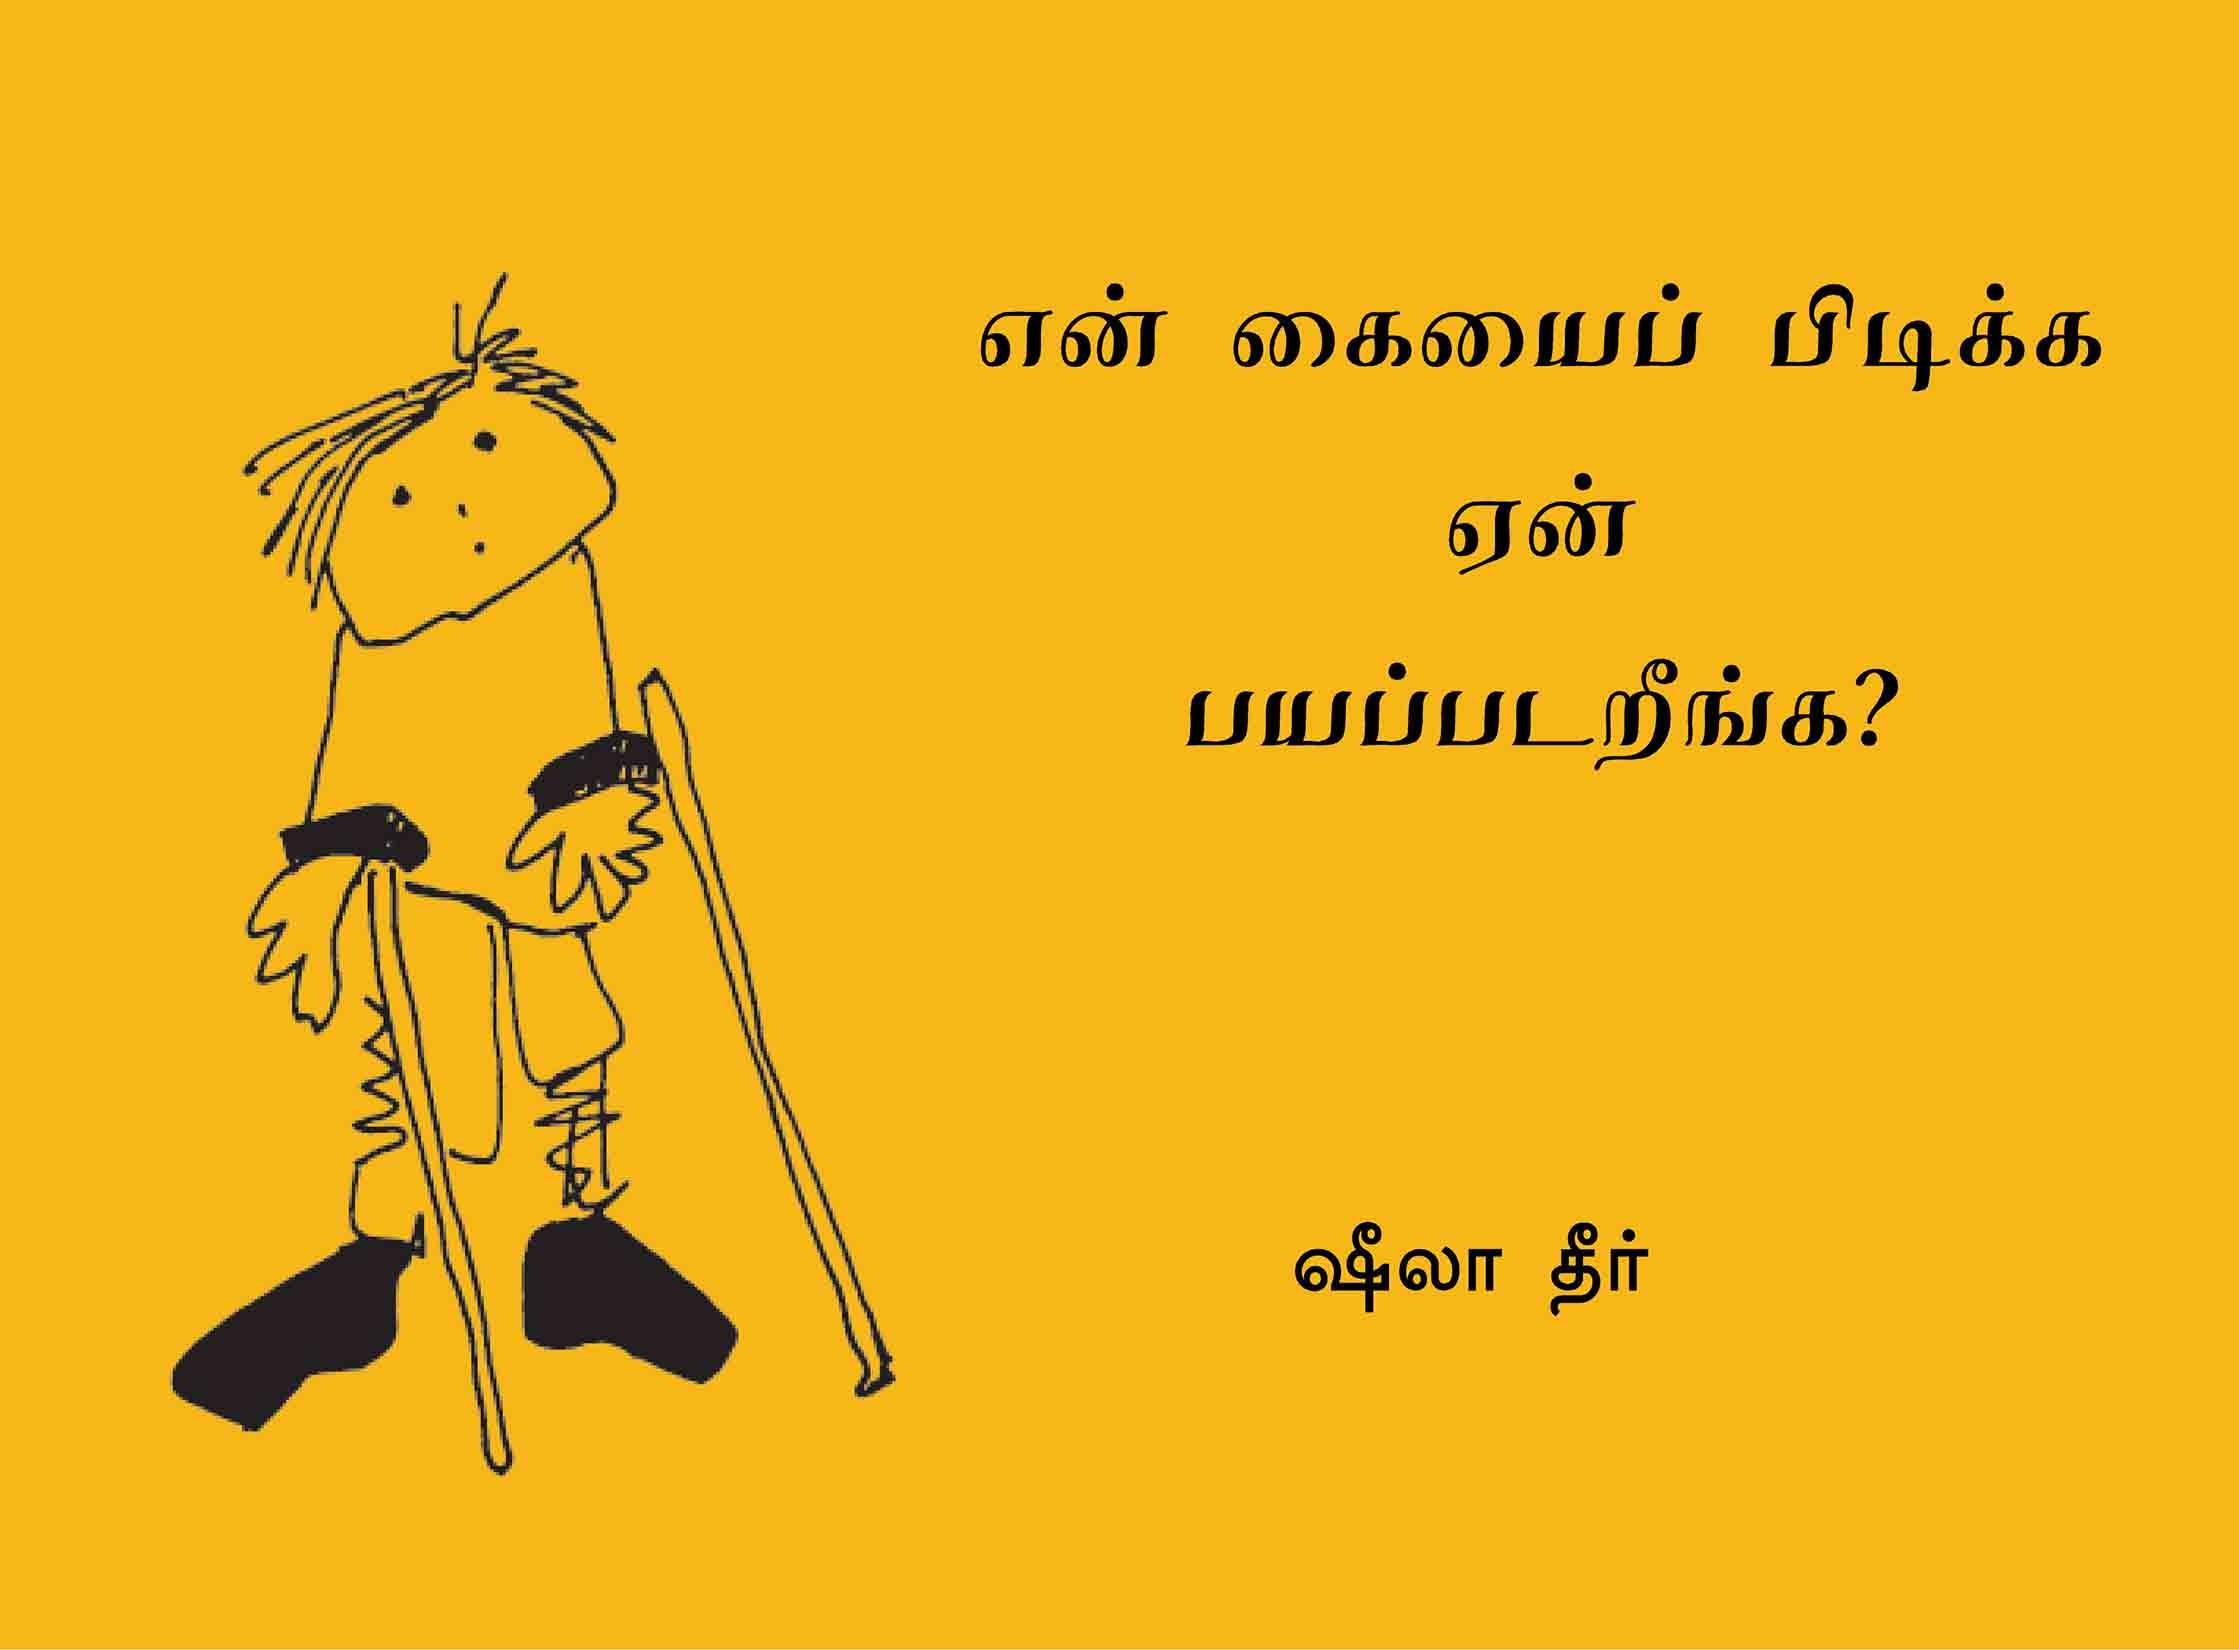 Why Are You Afraid To Hold My Hand?/Yenn Kaiyai Pidikka Yen Bayappadareenga? (Tamil)